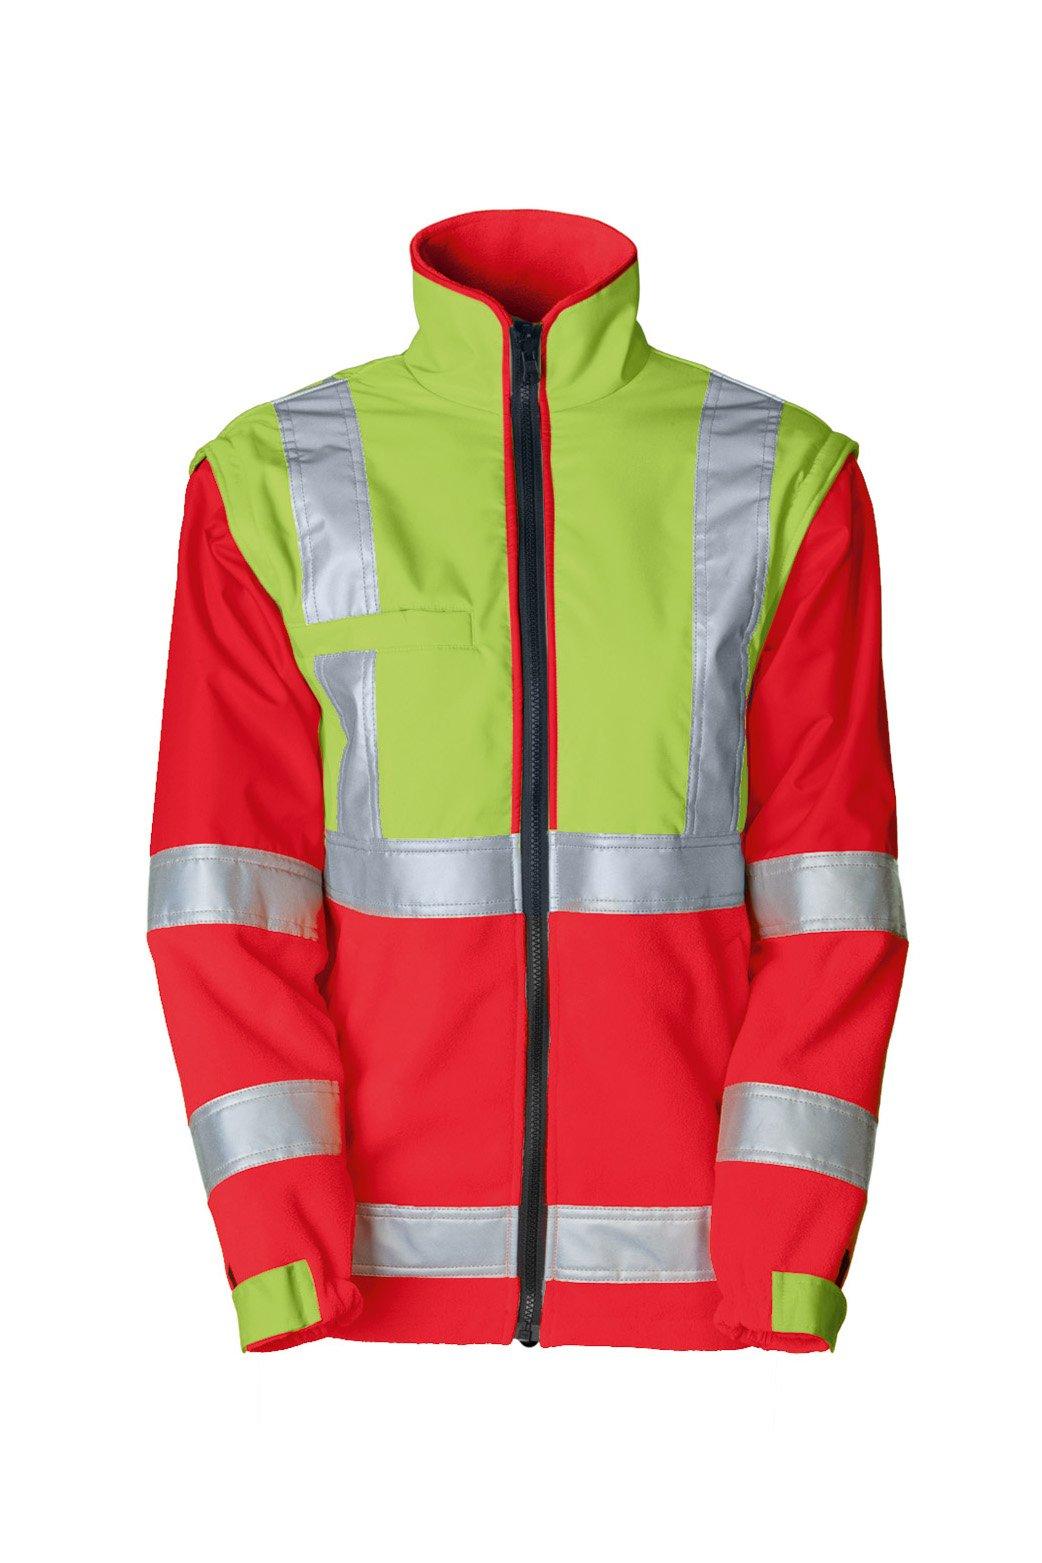 Sicherheitsfleecejacke, fluorescent lemon/navy, ISO 20471 Kl. 1/2